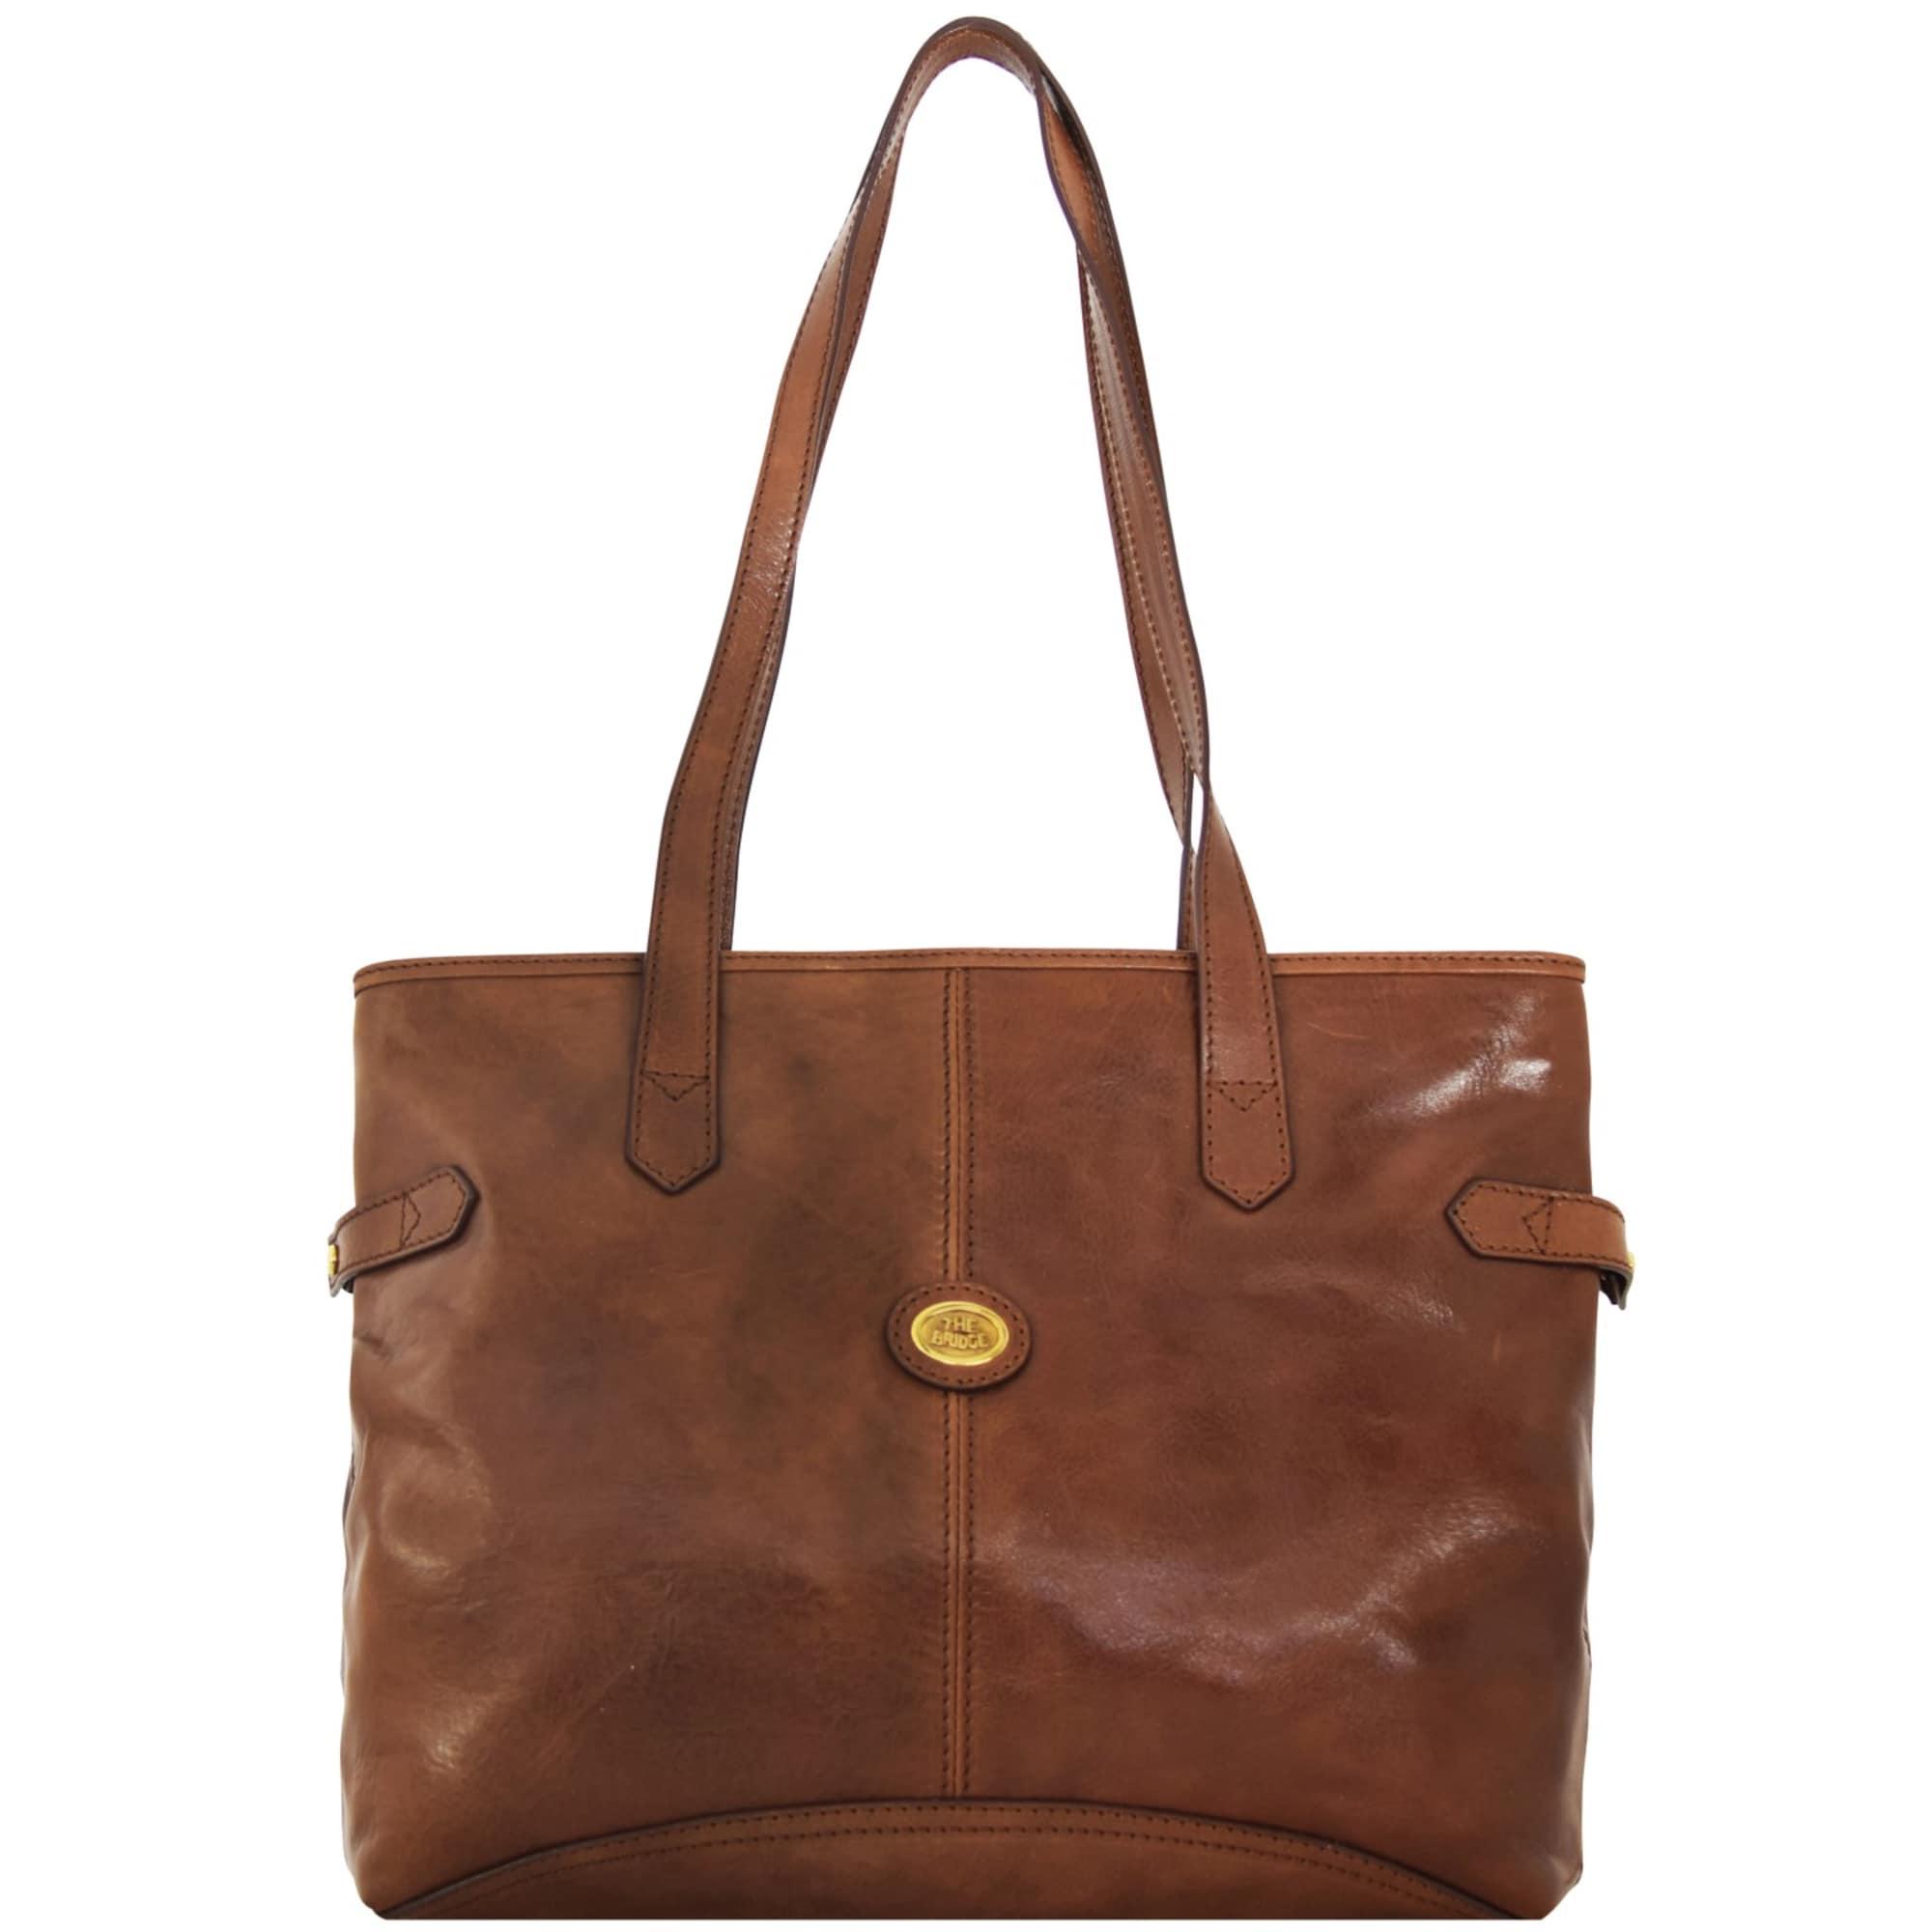 Story Donna Shopper Tasche Leder 37 cm | Taschen > Handtaschen > Shopper | The Bridge